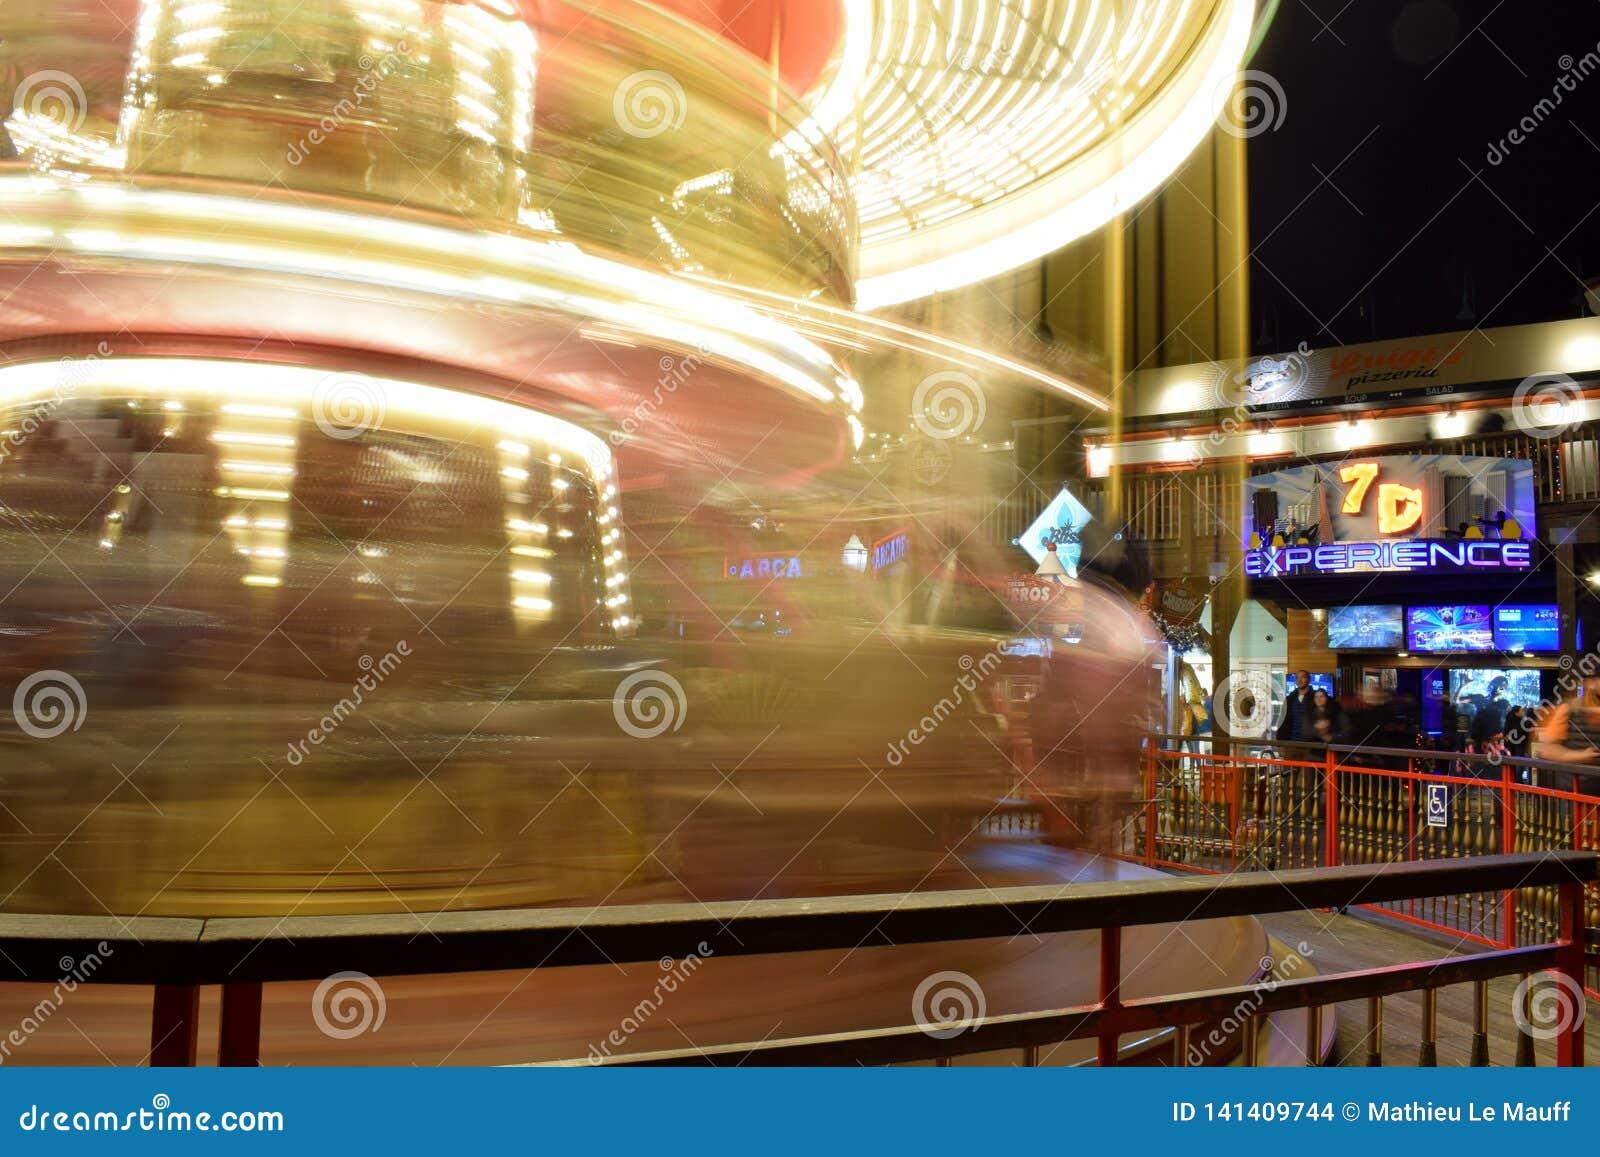 Illuminated Merry Go Round in San Francisco - Long Exposure